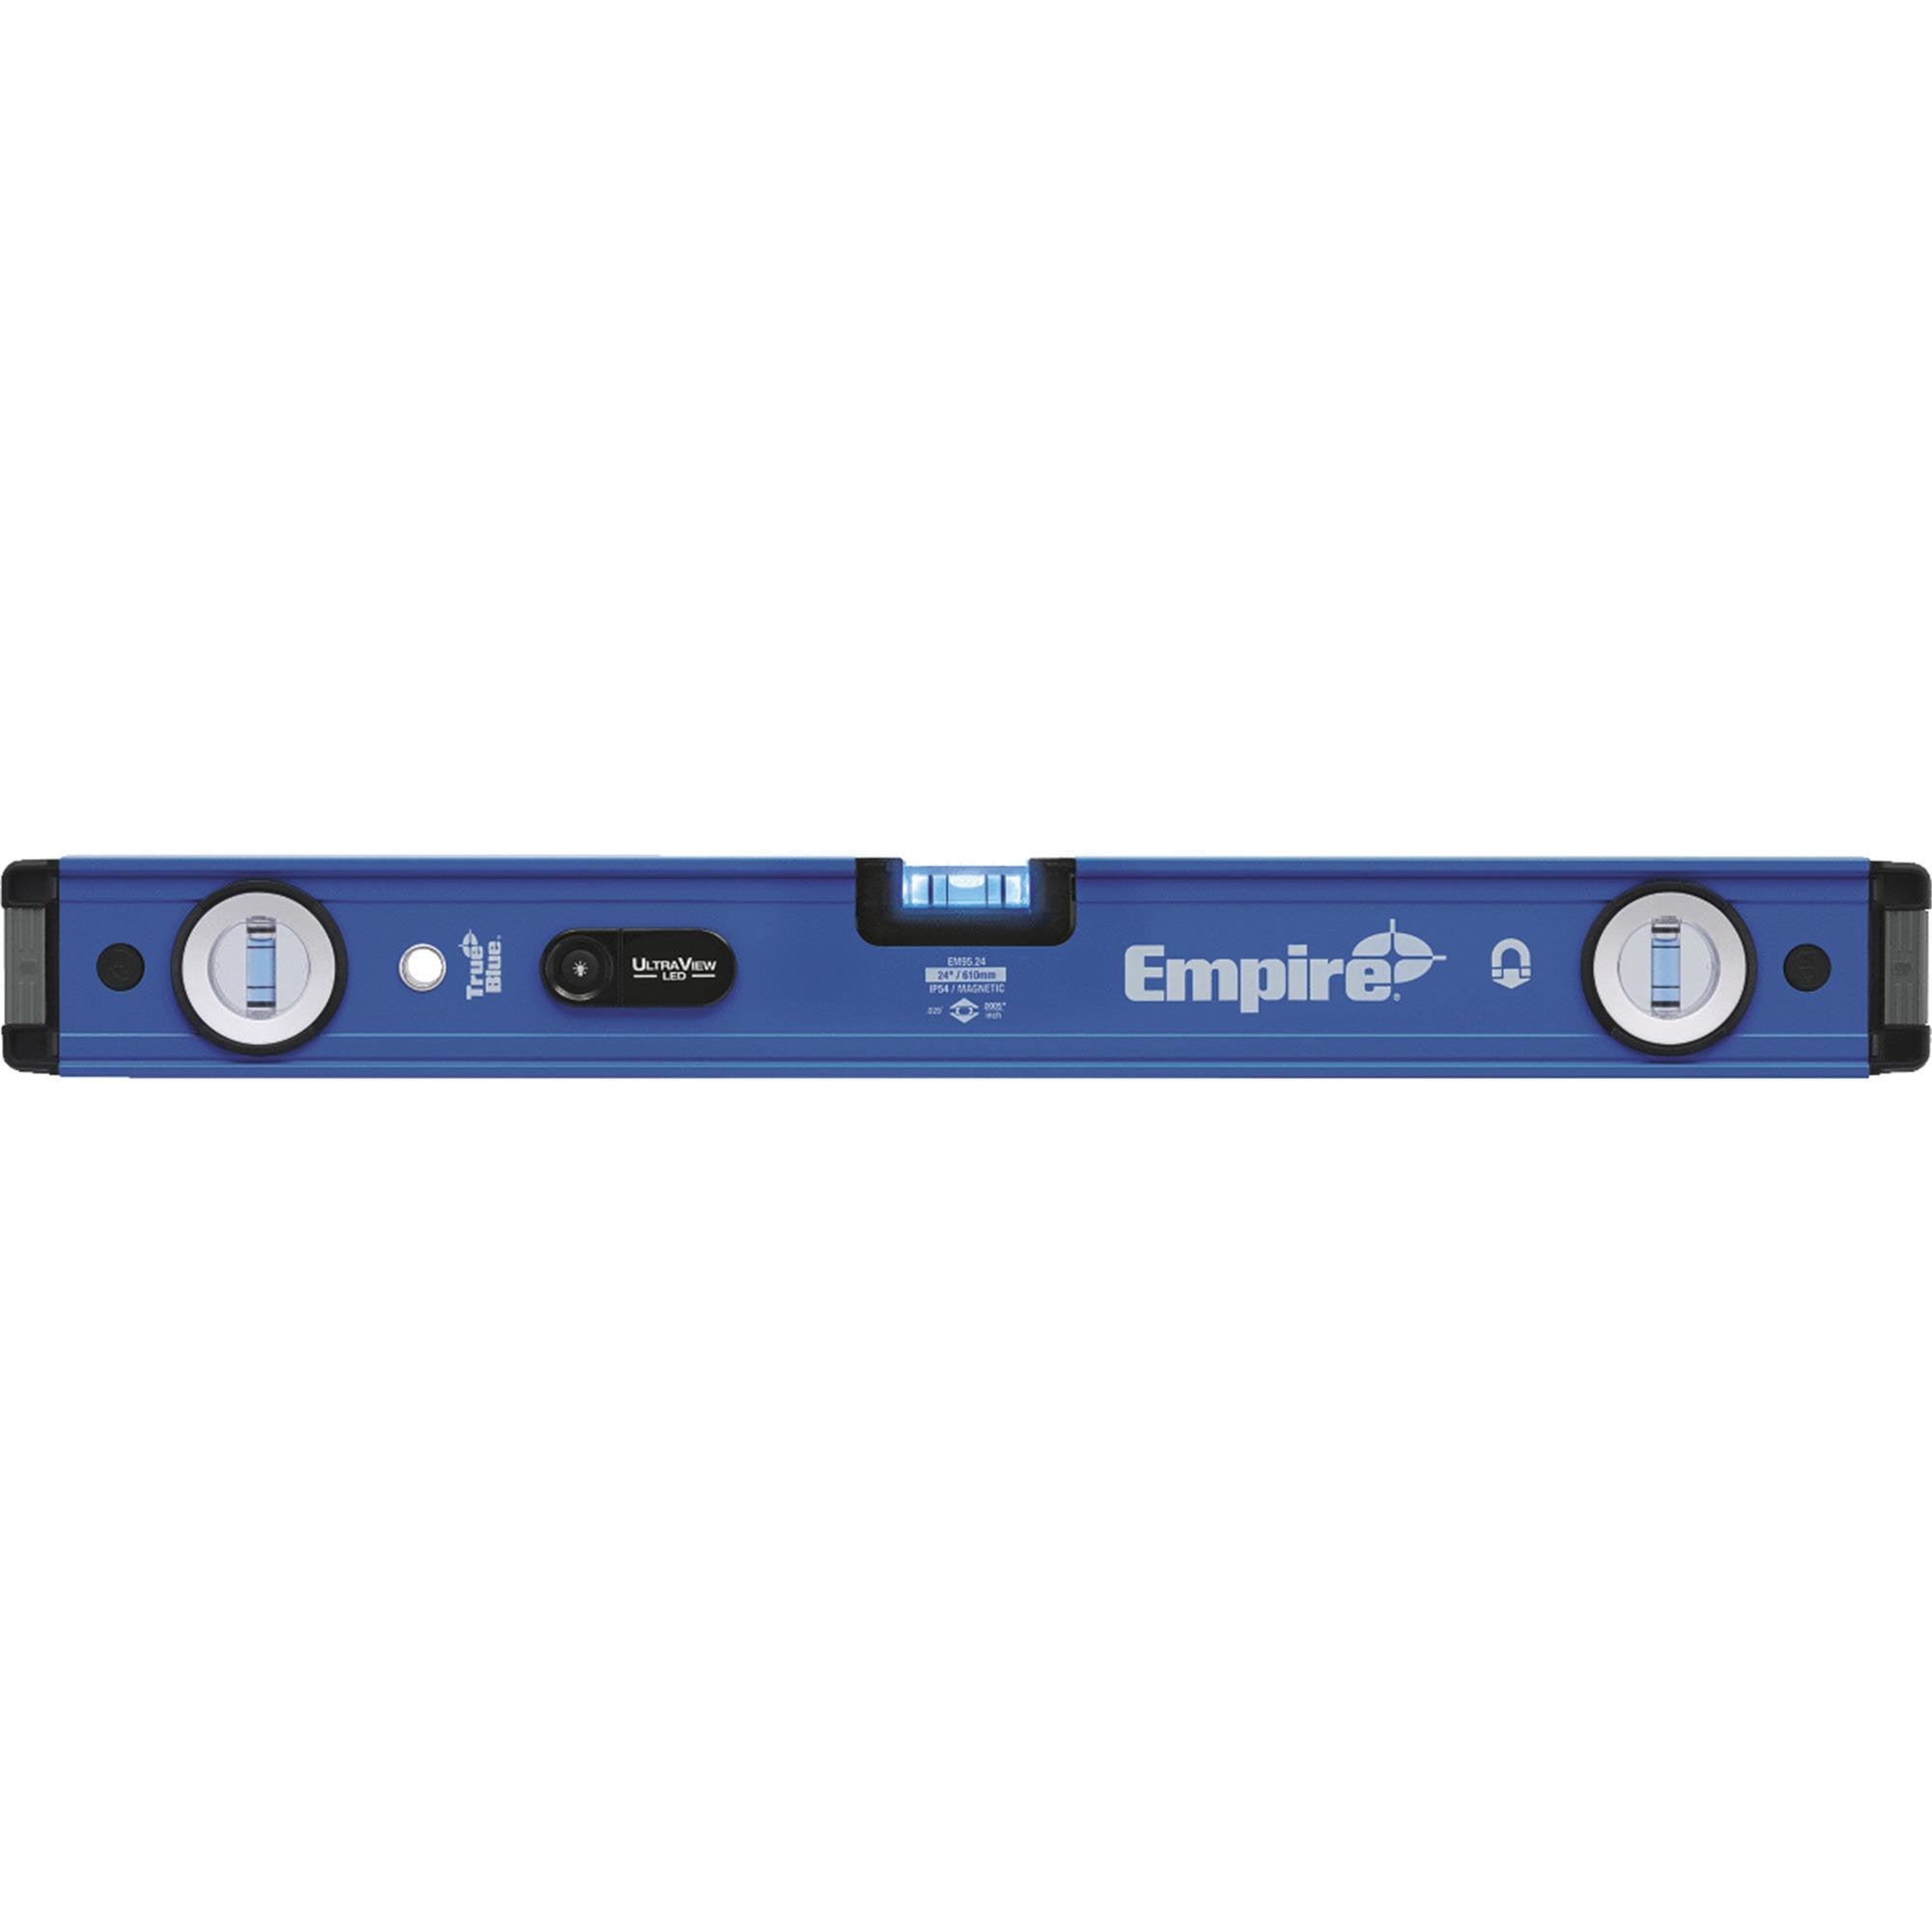 Empire True Blue UltraView LED Box Level